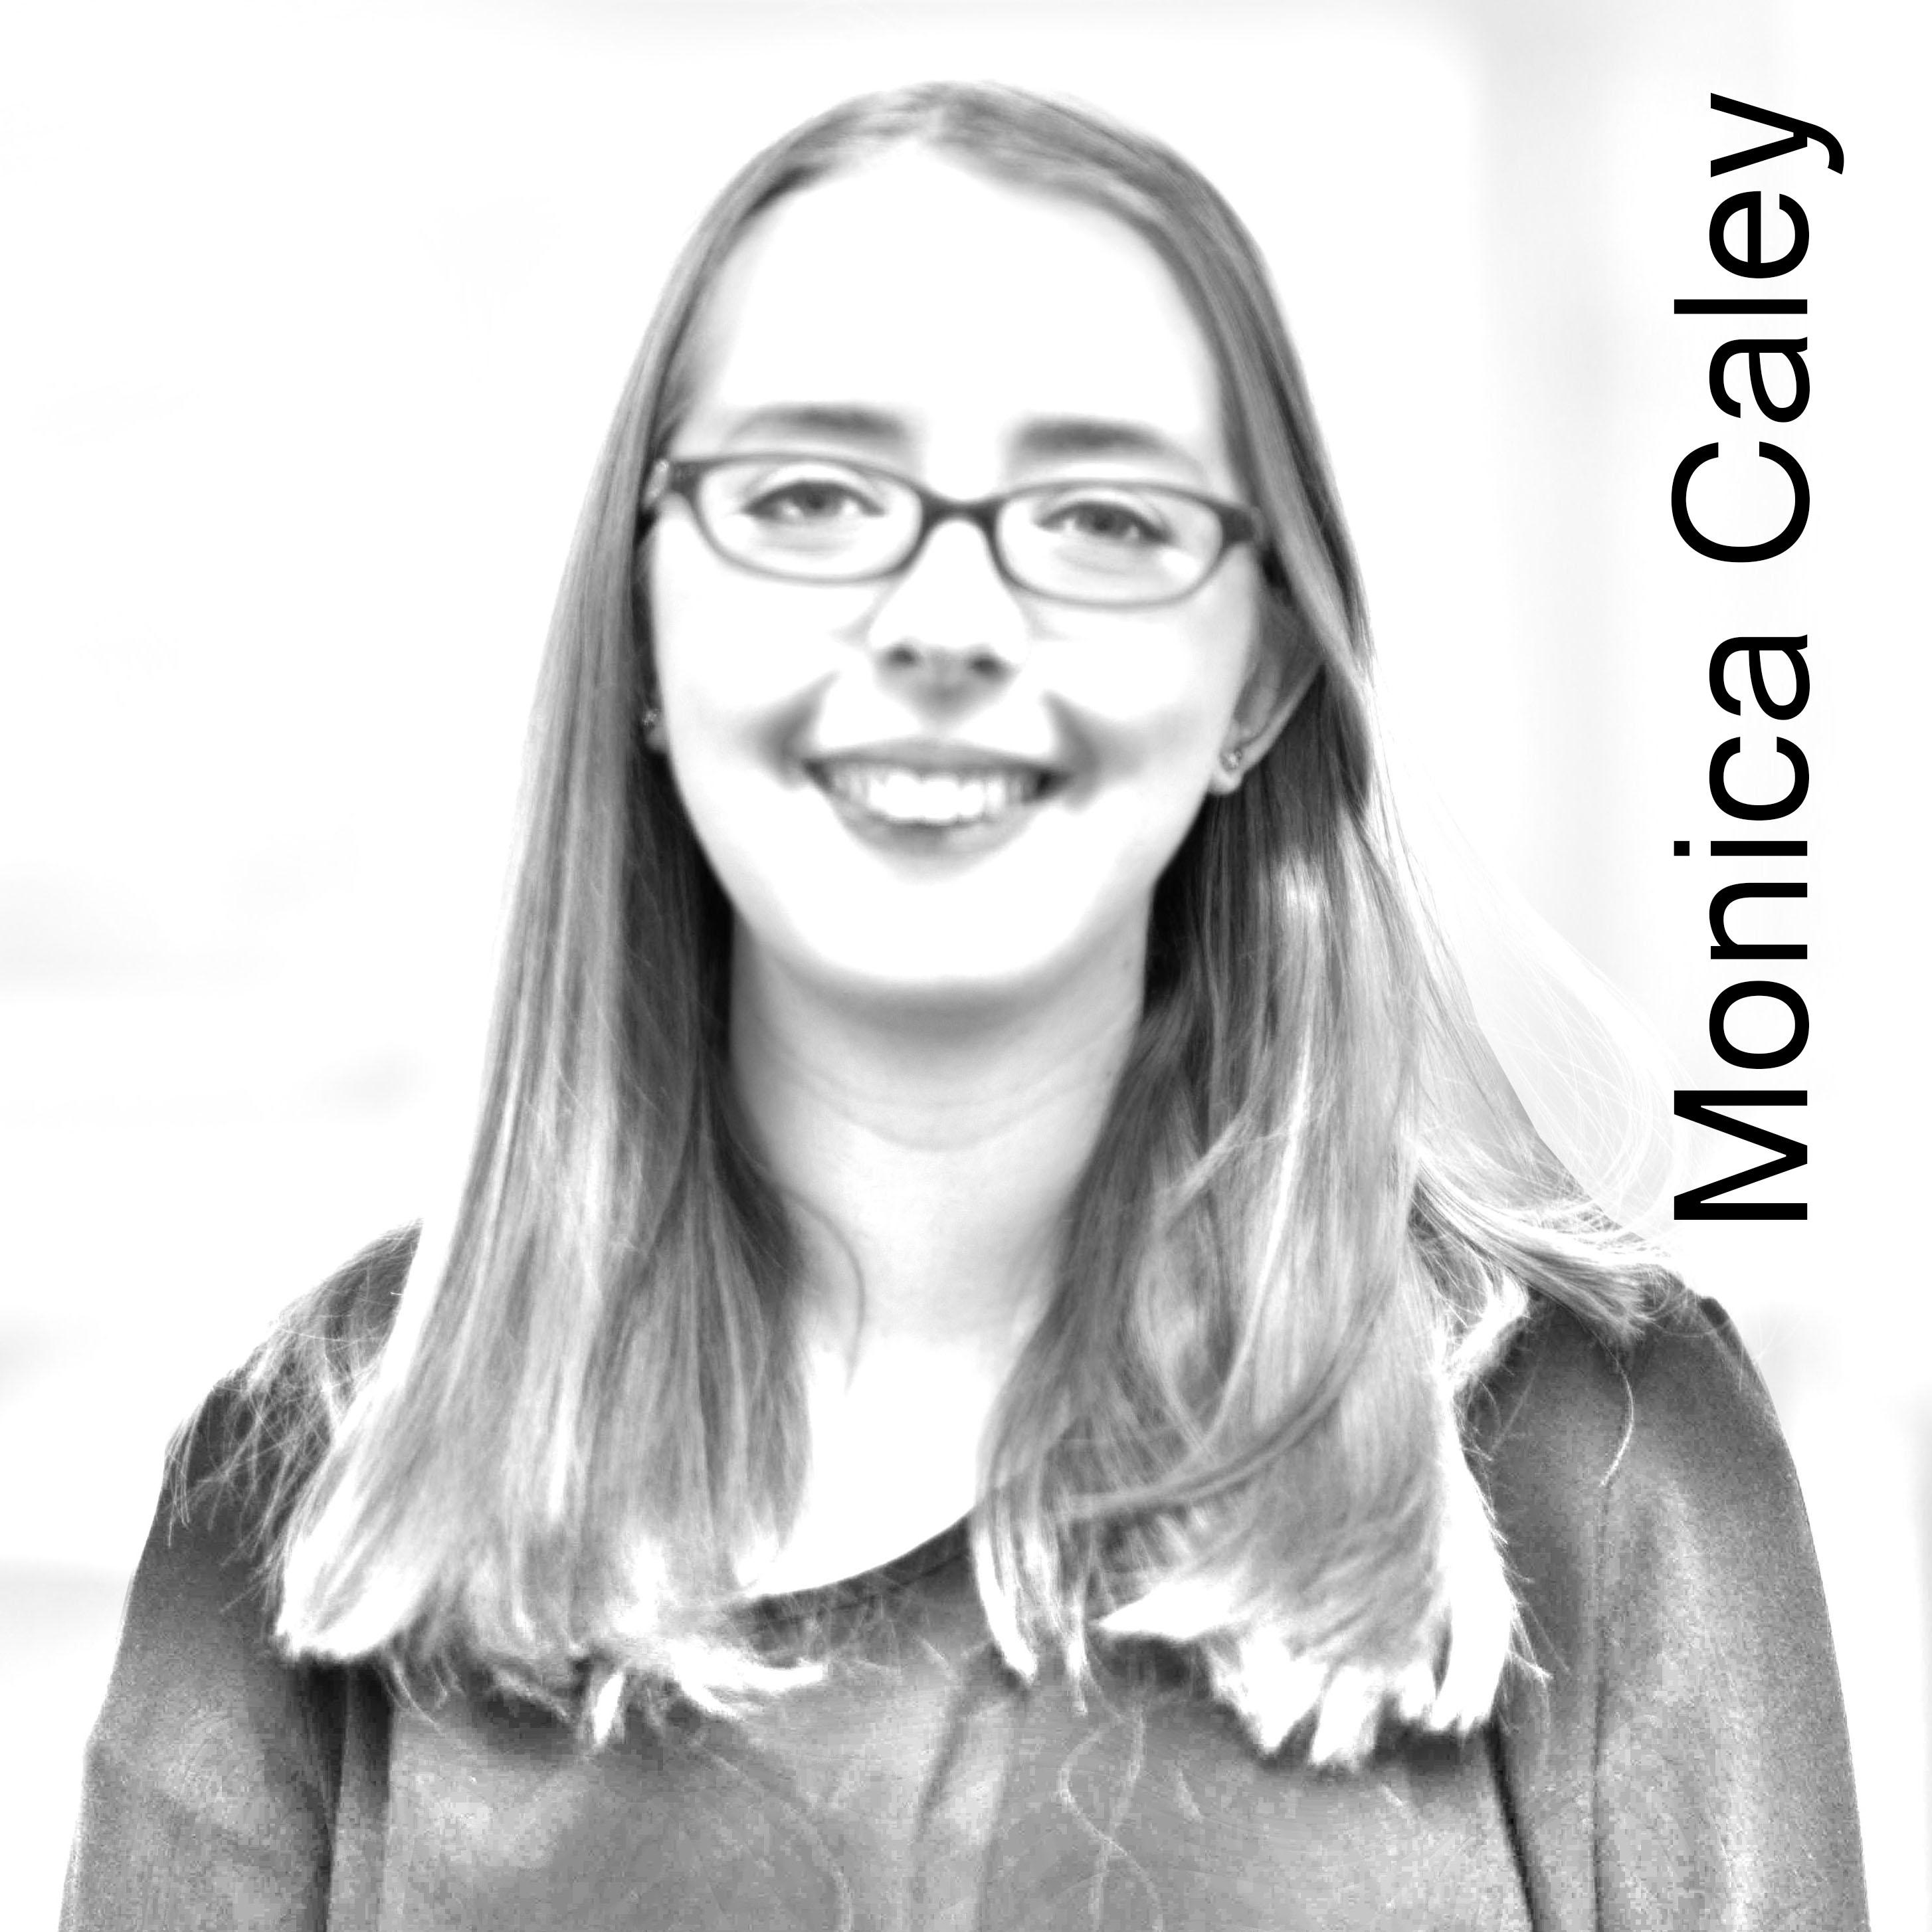 monica_caley_2_square.jpg